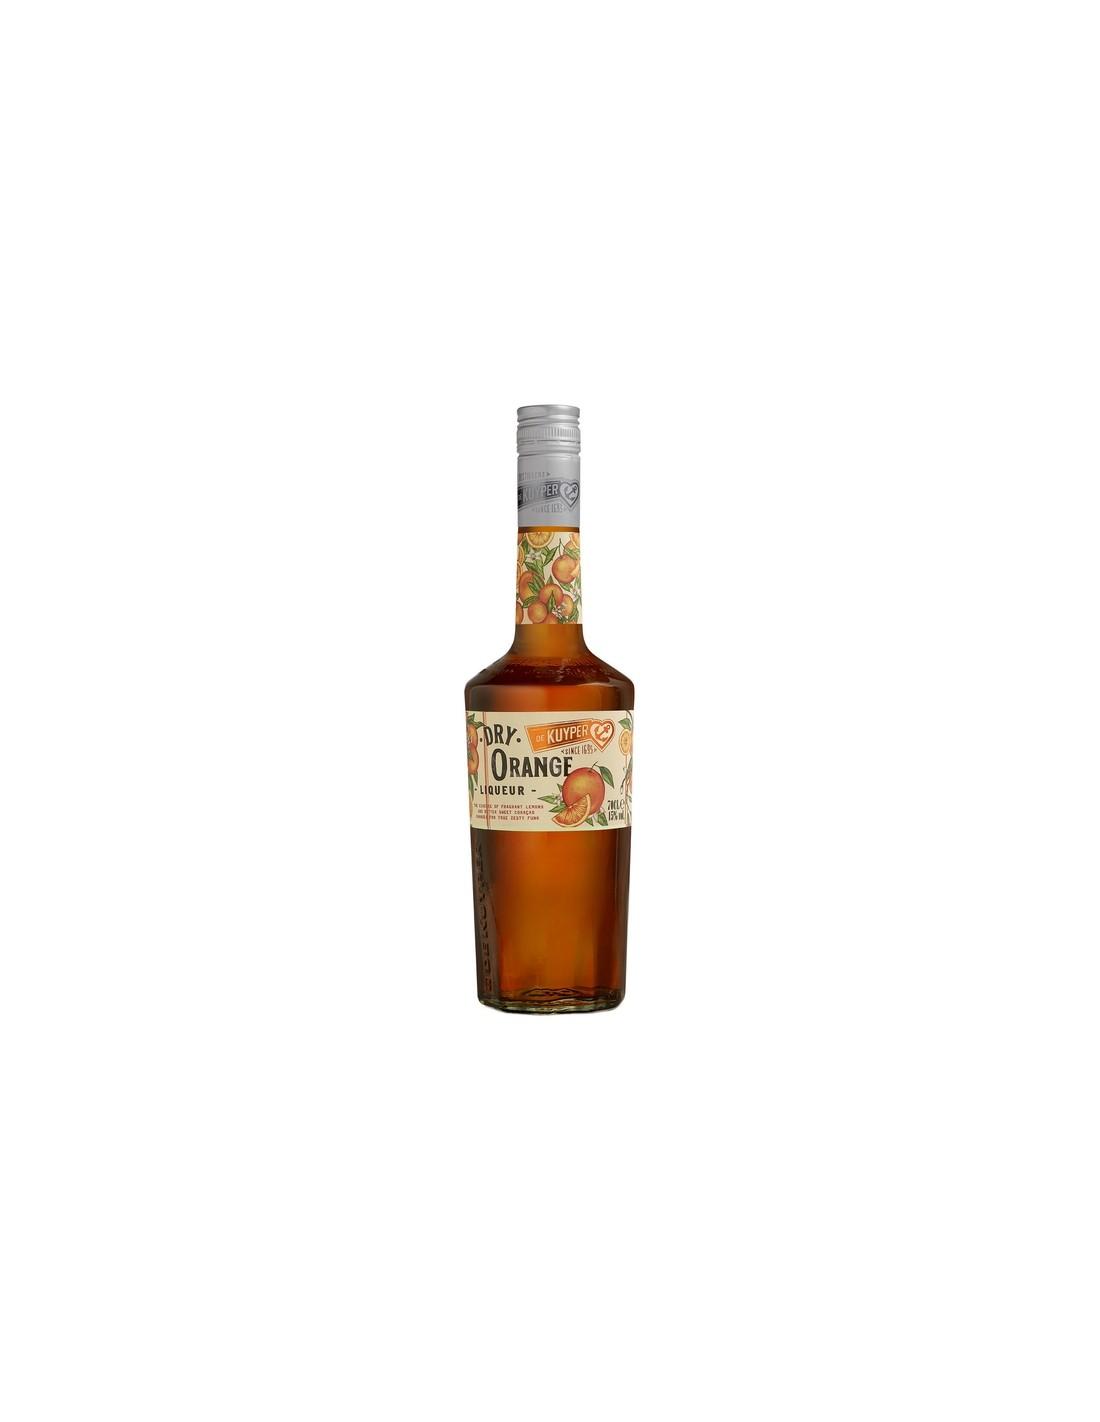 Lichior De Kuyper Dry Orange 0.7l Alc. 15%